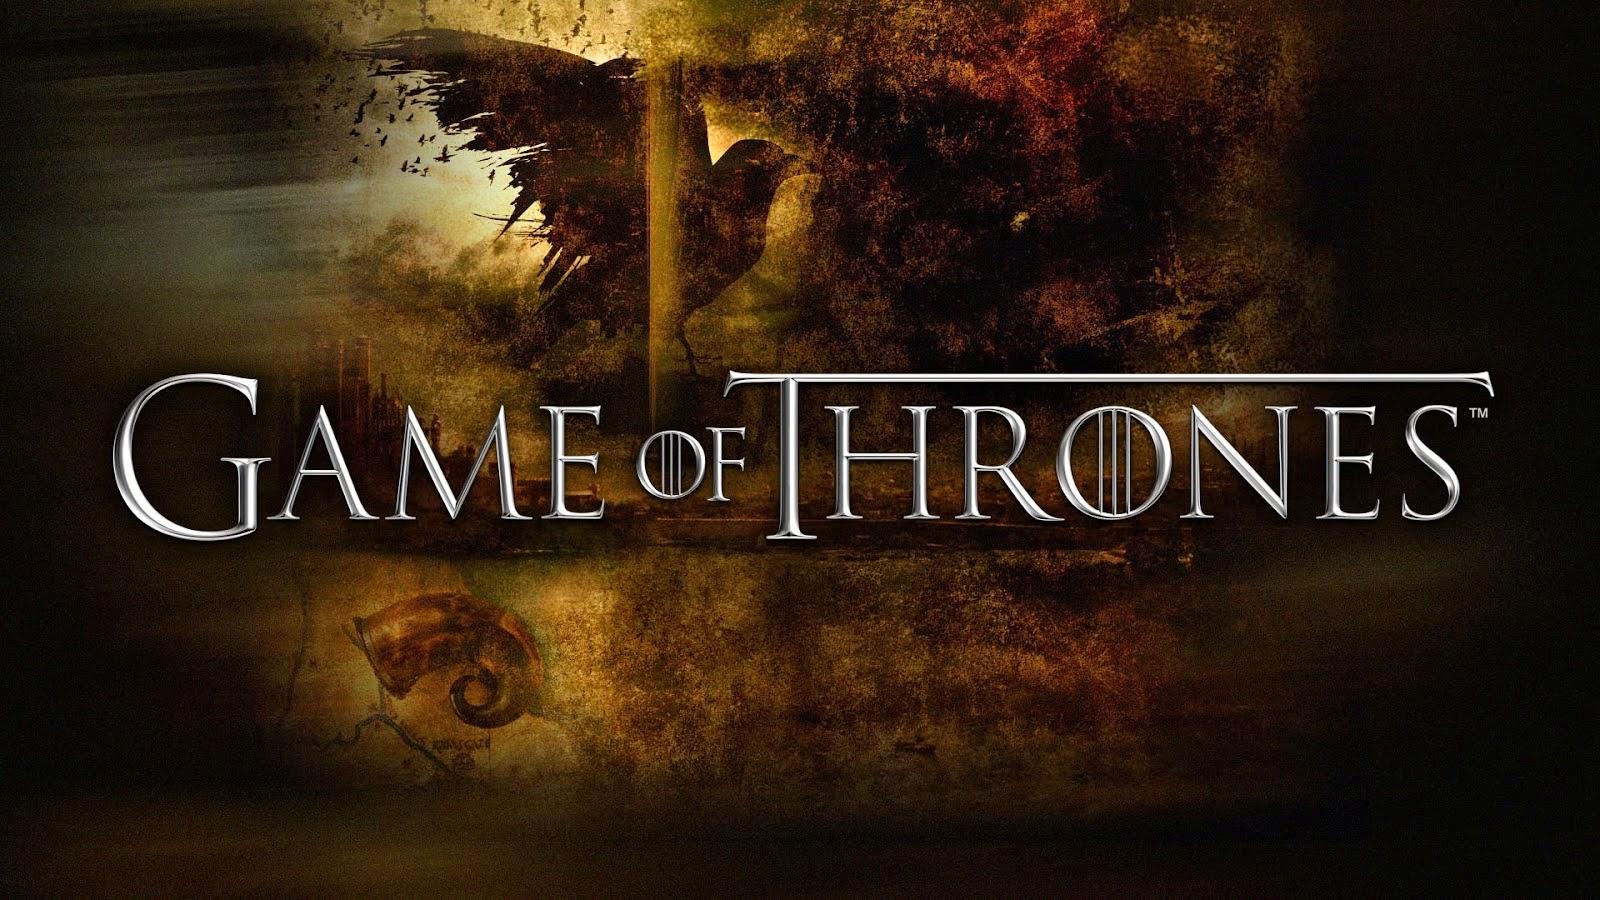 watch game of thrones season 5 free